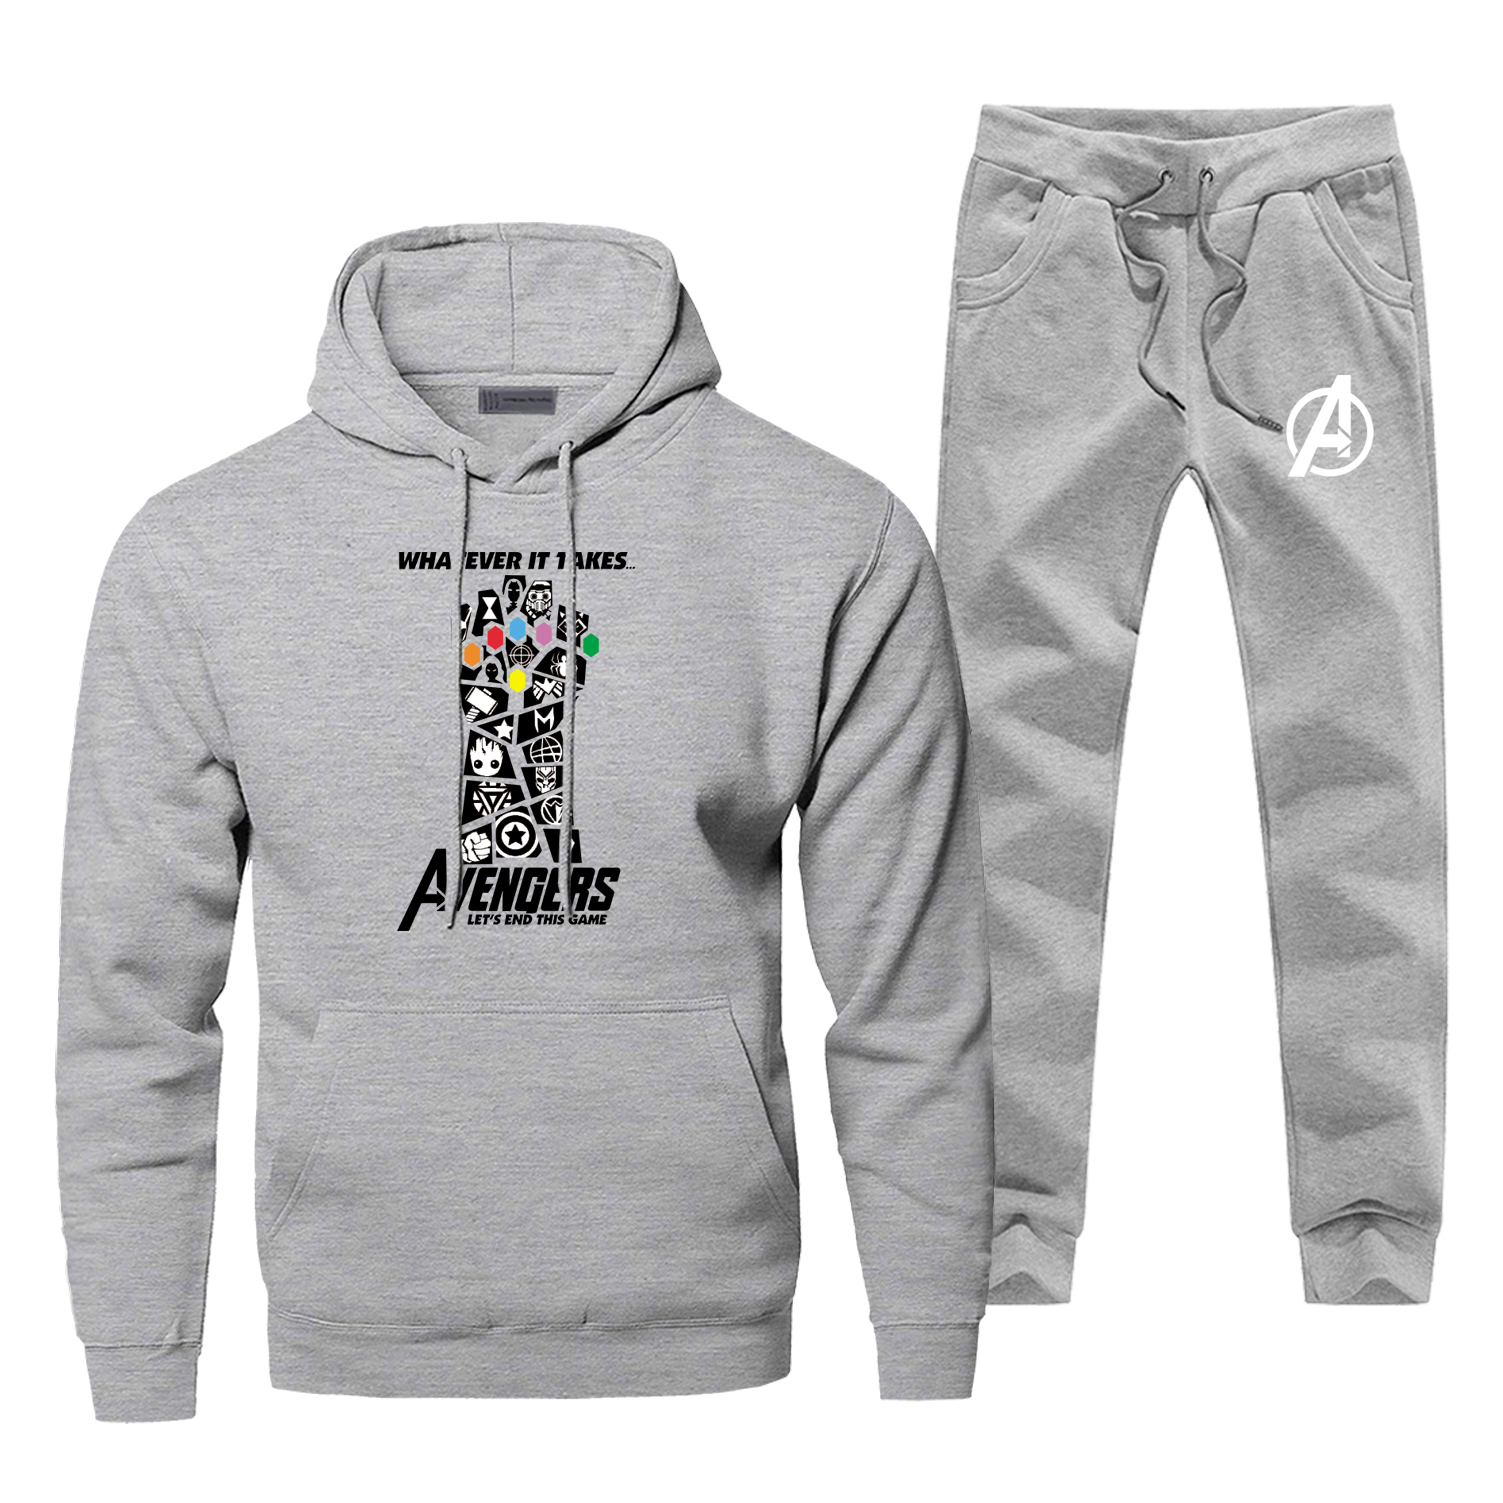 Men Thanos Infinity Gauntlet Hoodie Male Pants Set Sweatshirt Mens Hoodies Sweatshirts Sets Two Piece Pant Pullover 2Pcs Coat